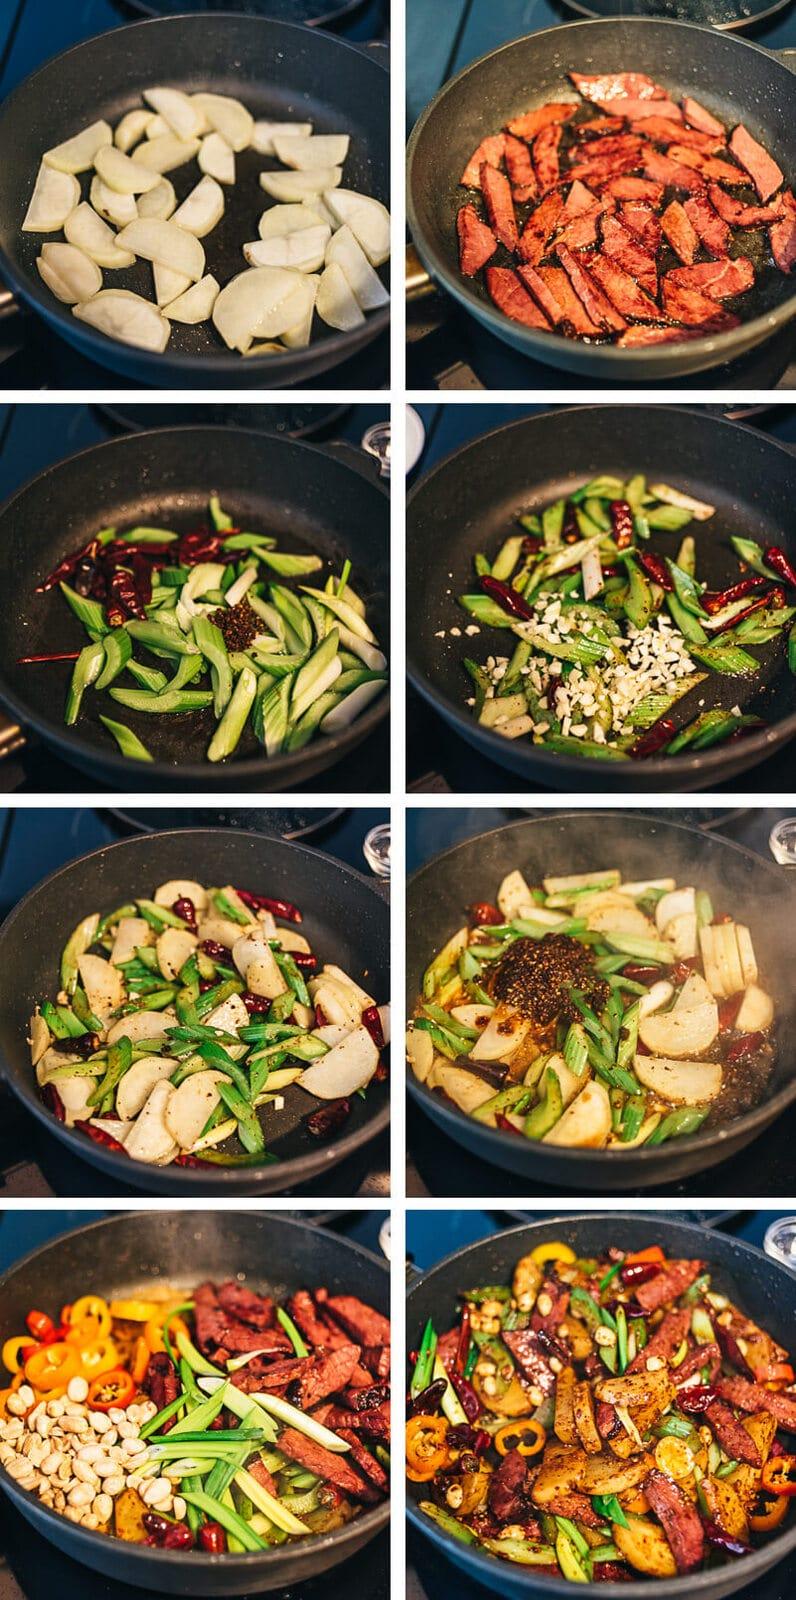 Kung Pao Pastrami Cooking Process